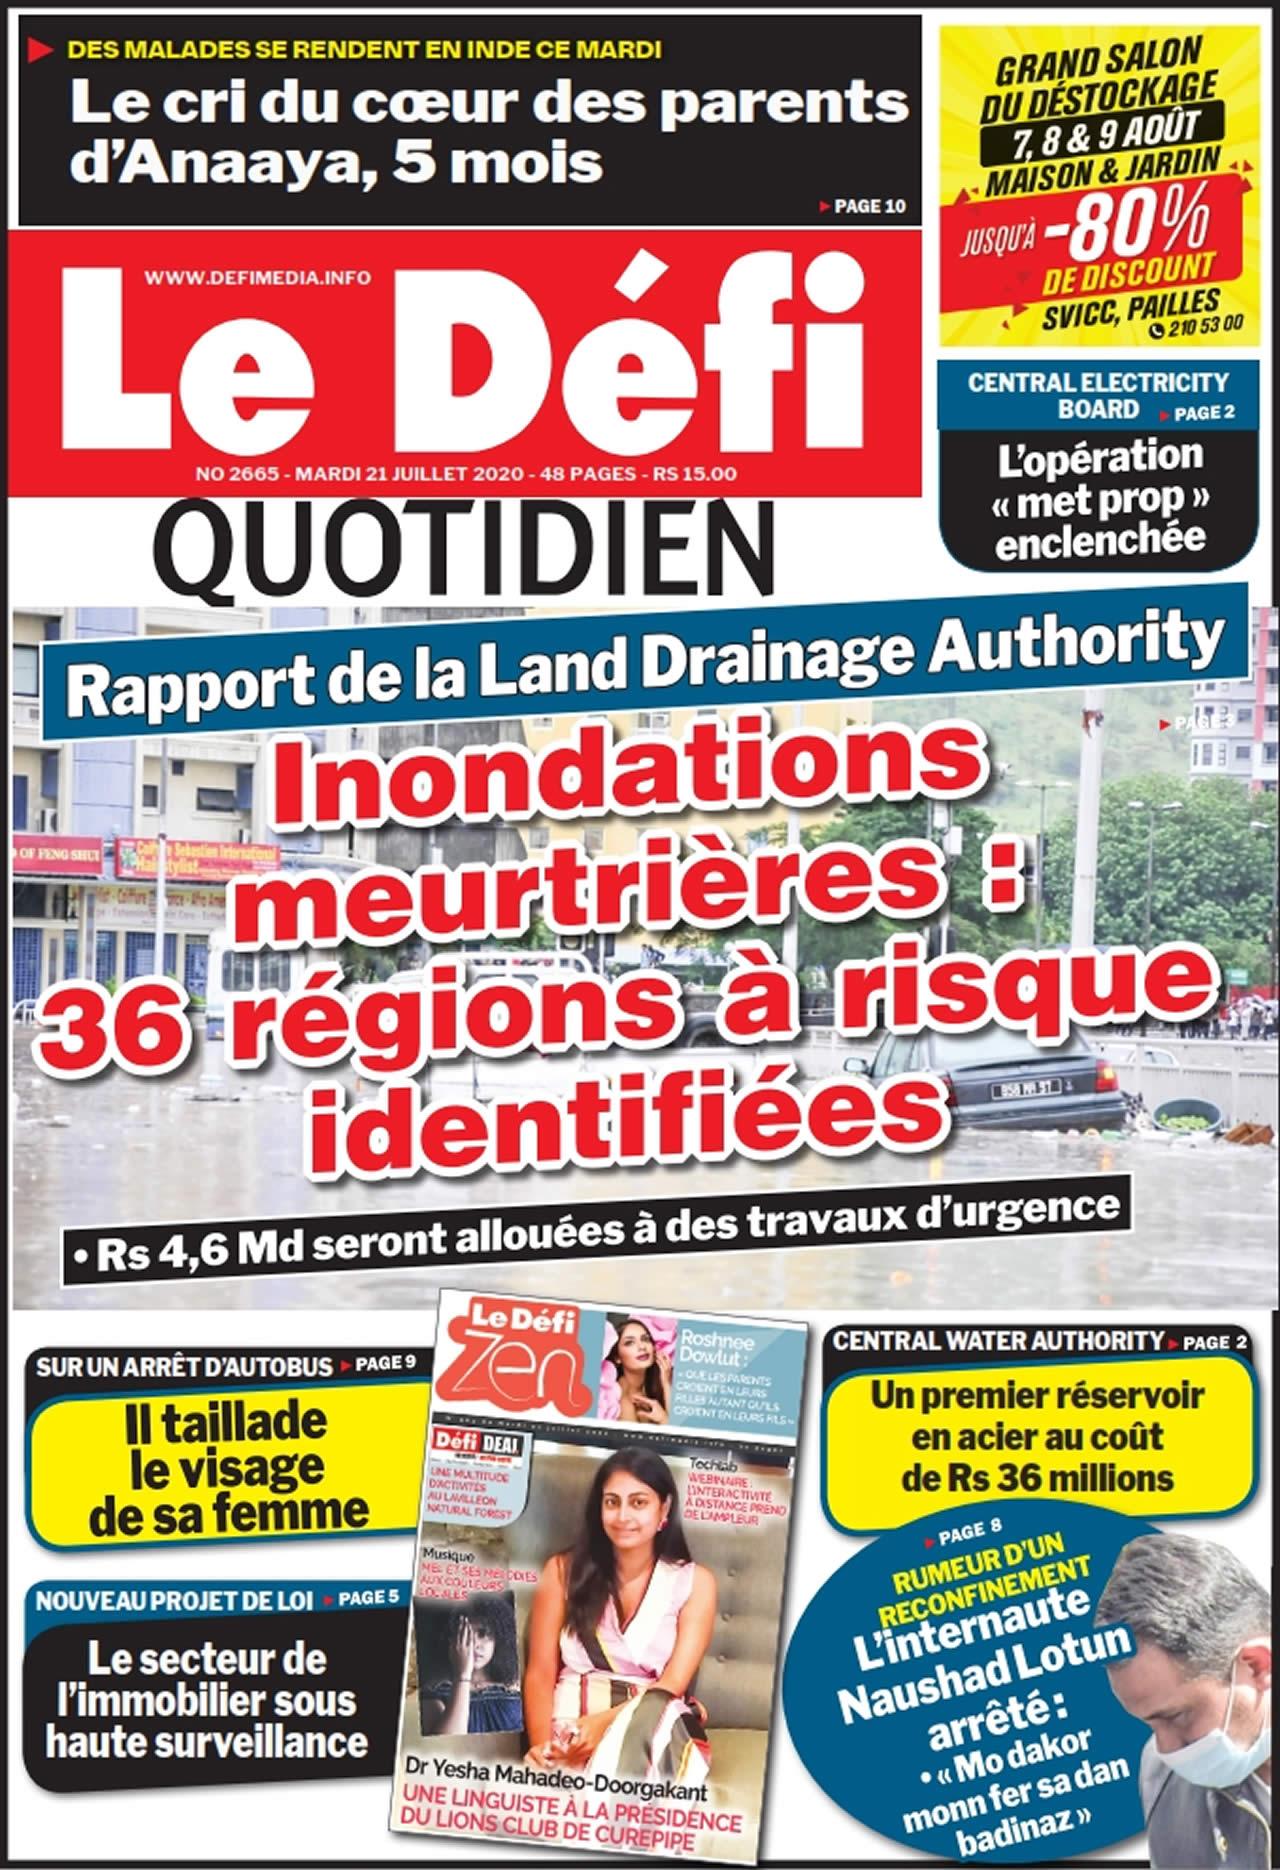 Quotidien 2665